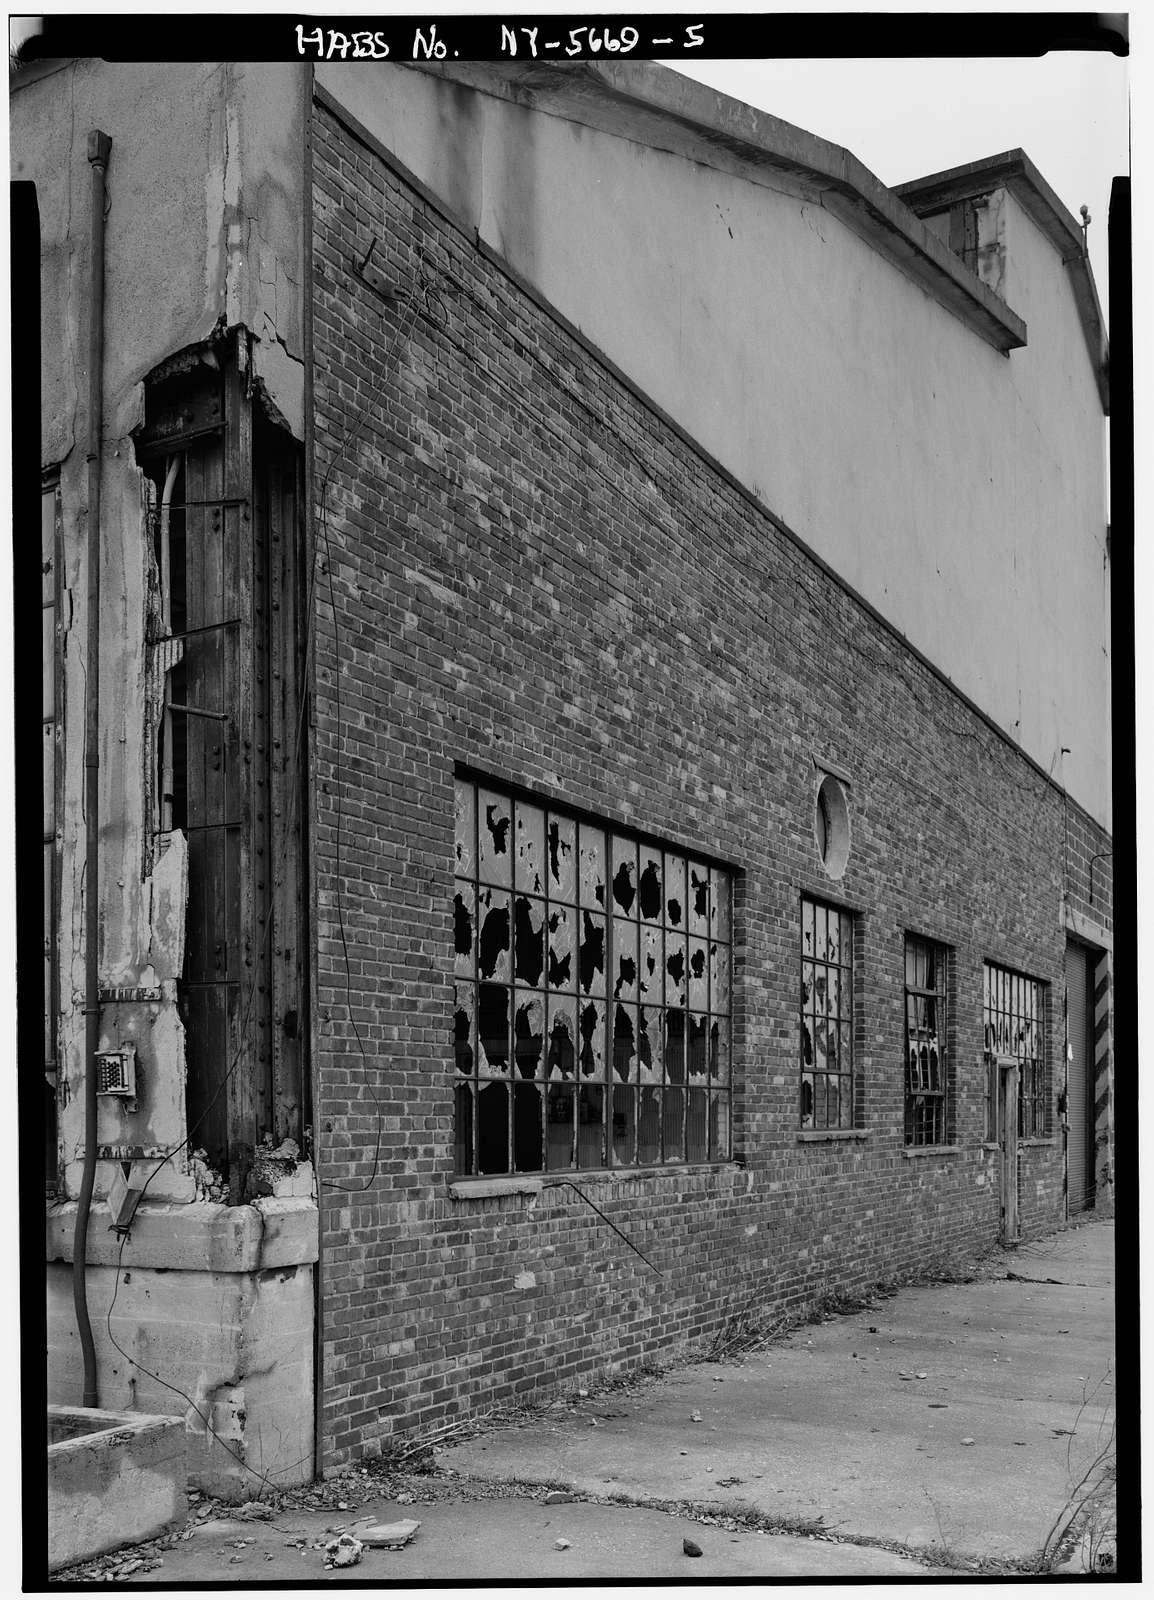 Miller Field, North Hangar, New Dorp Lane, Staten Island, New Dorp, Richmond County, NY